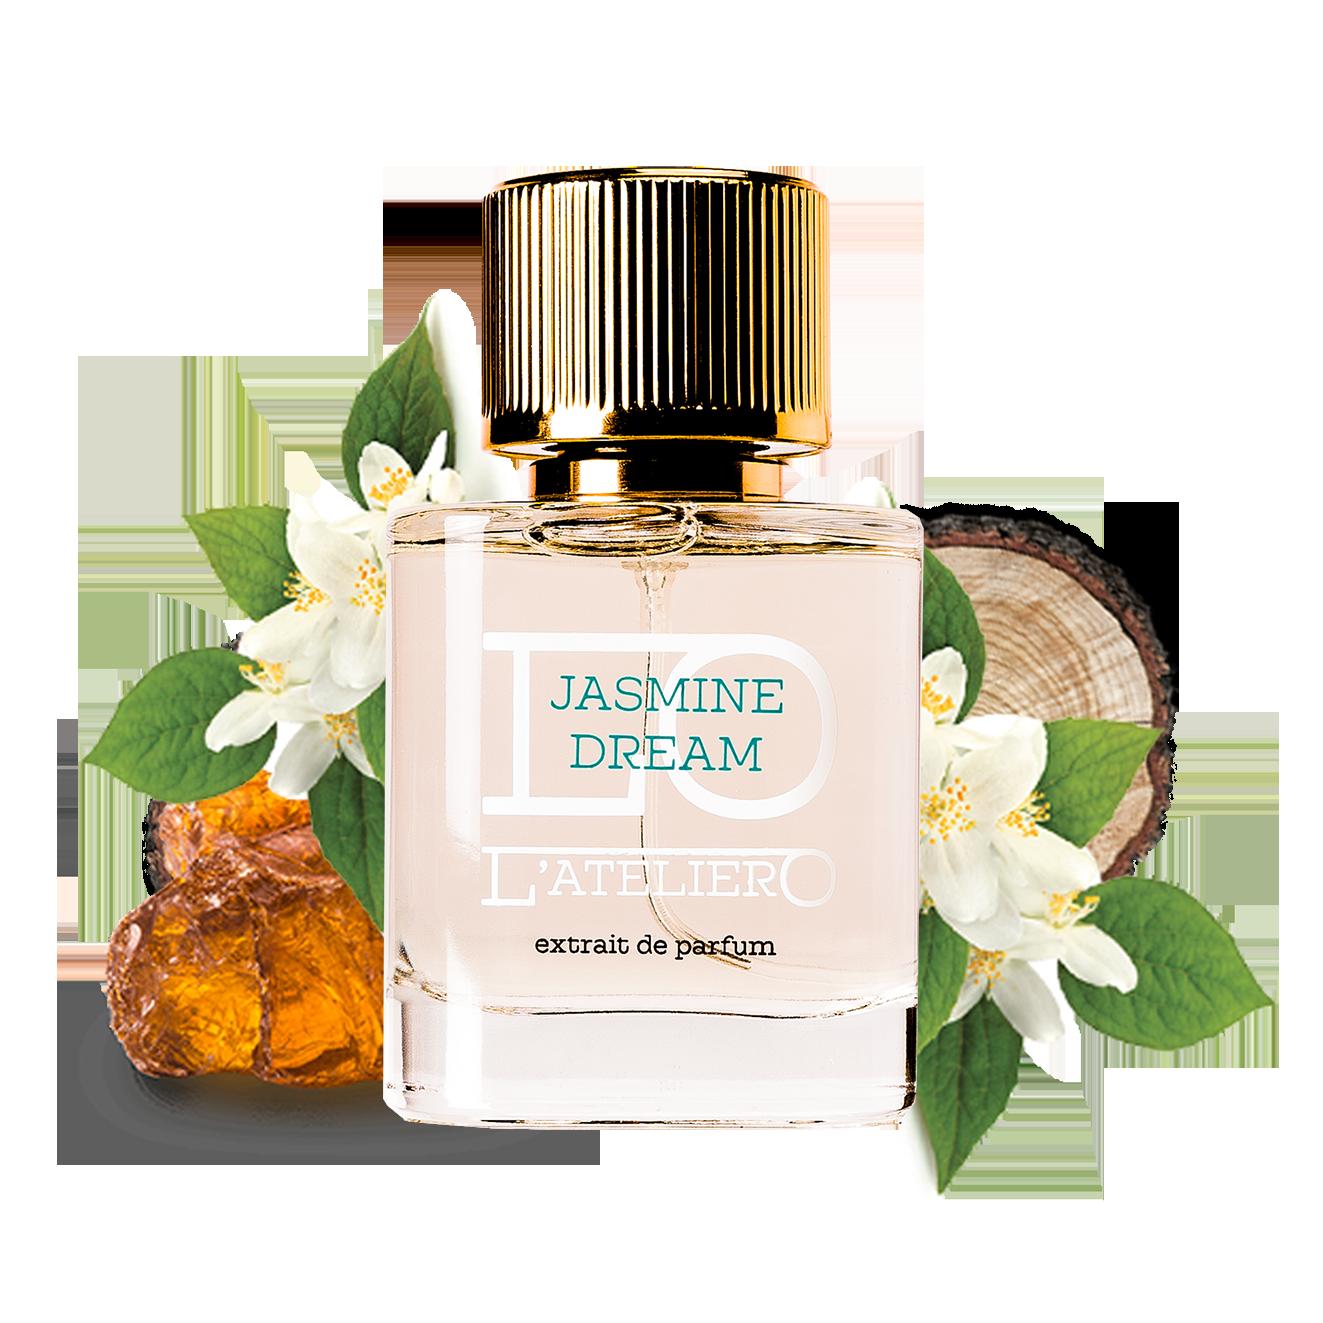 Jasmine Dream Parfum